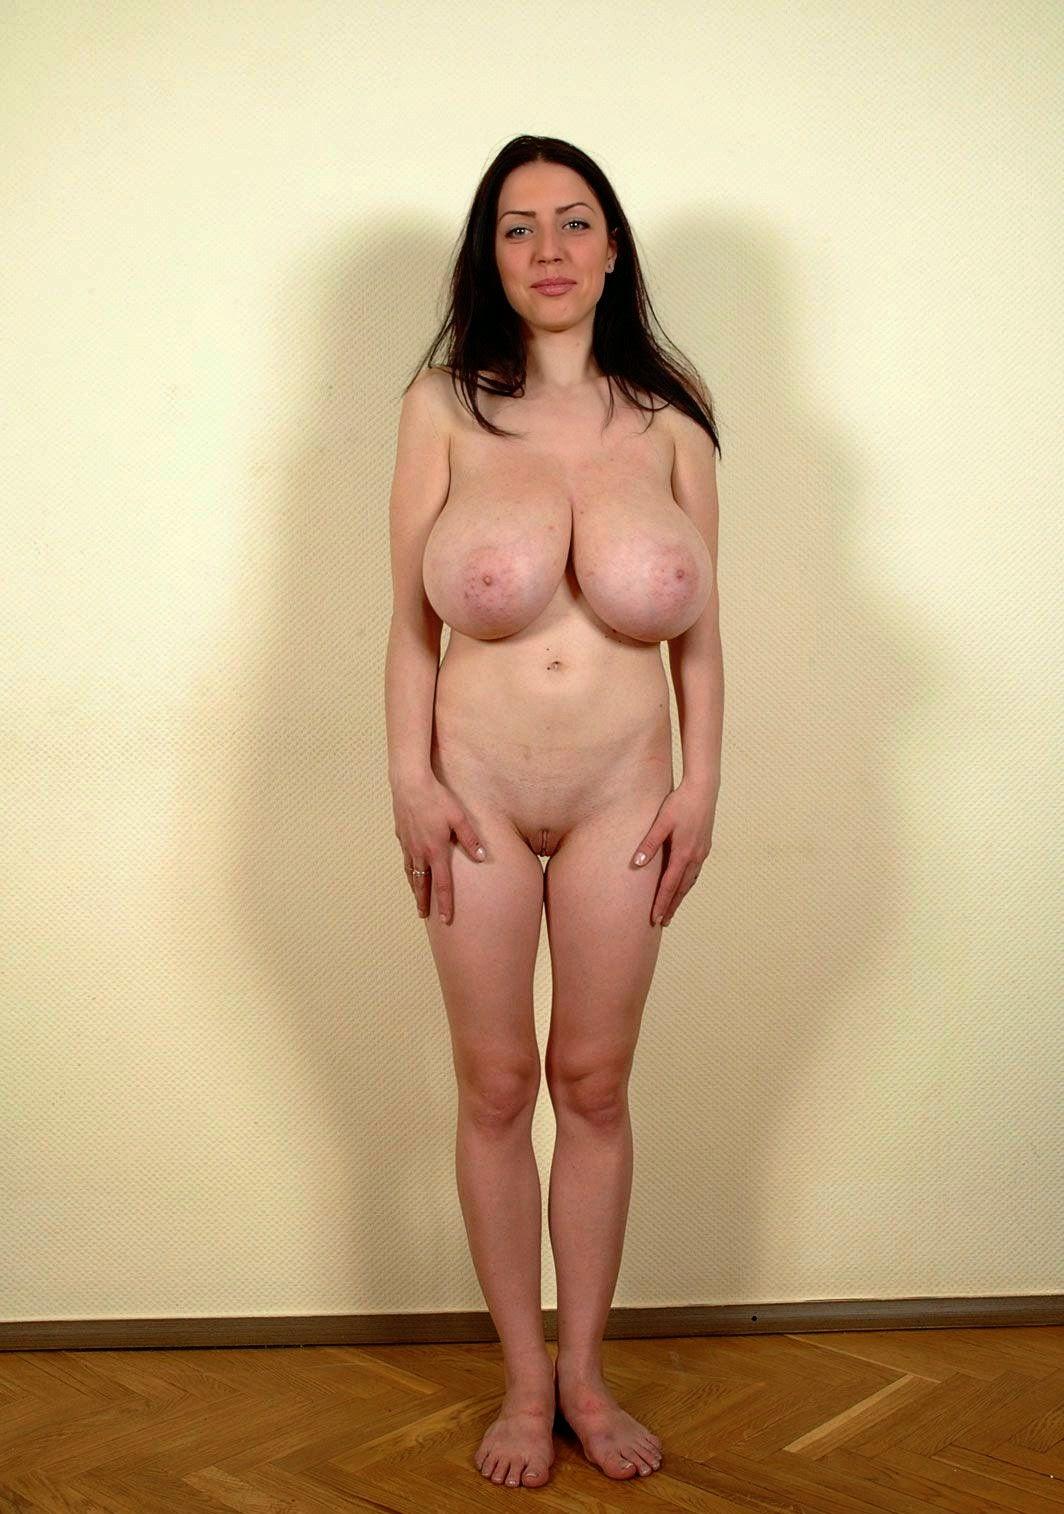 image Huge natural boobs bikini wet tshirt